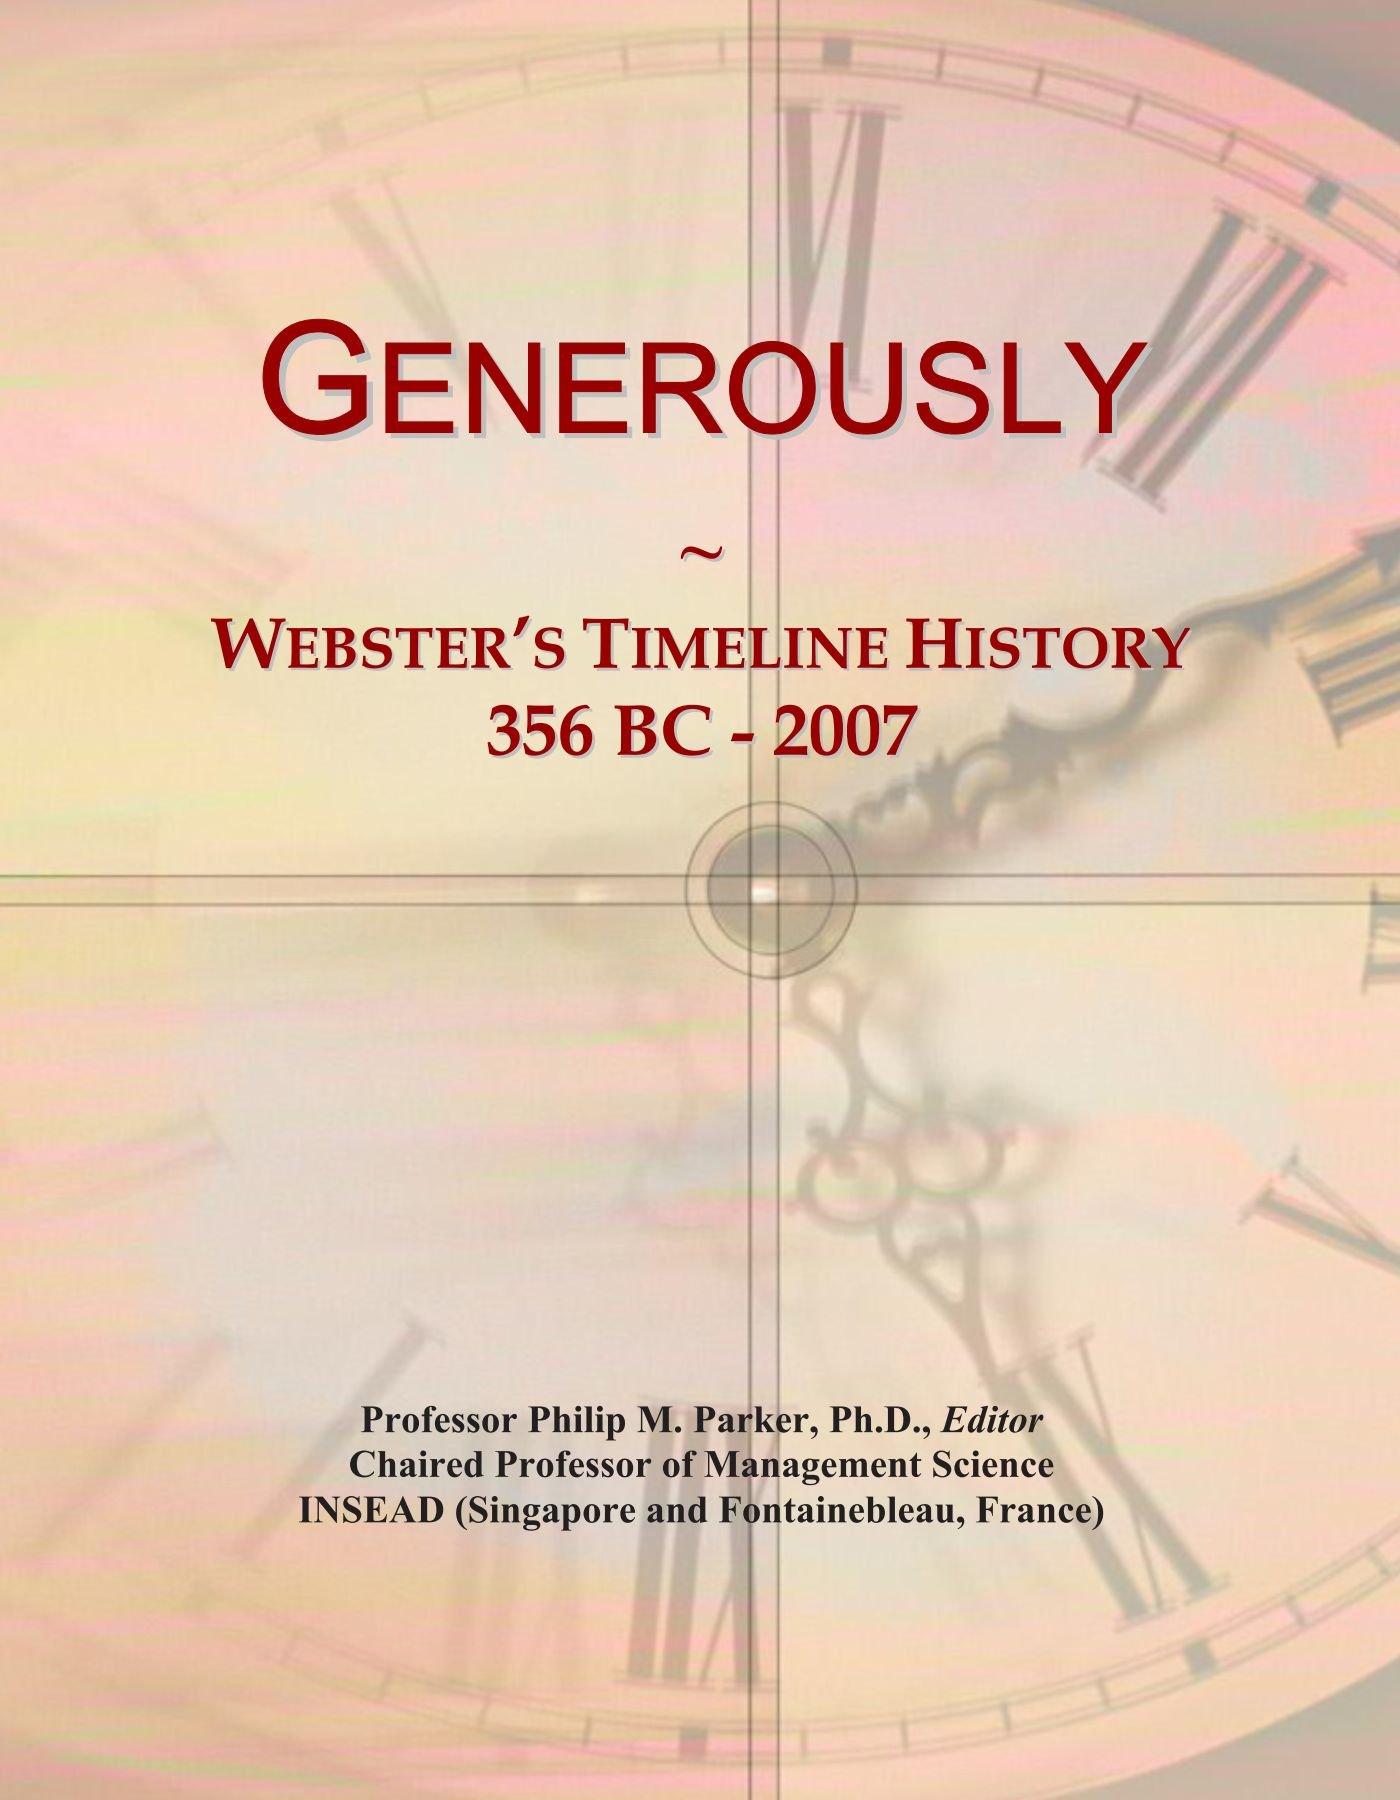 Download Generously: Webster's Timeline History, 356 BC - 2007 ebook